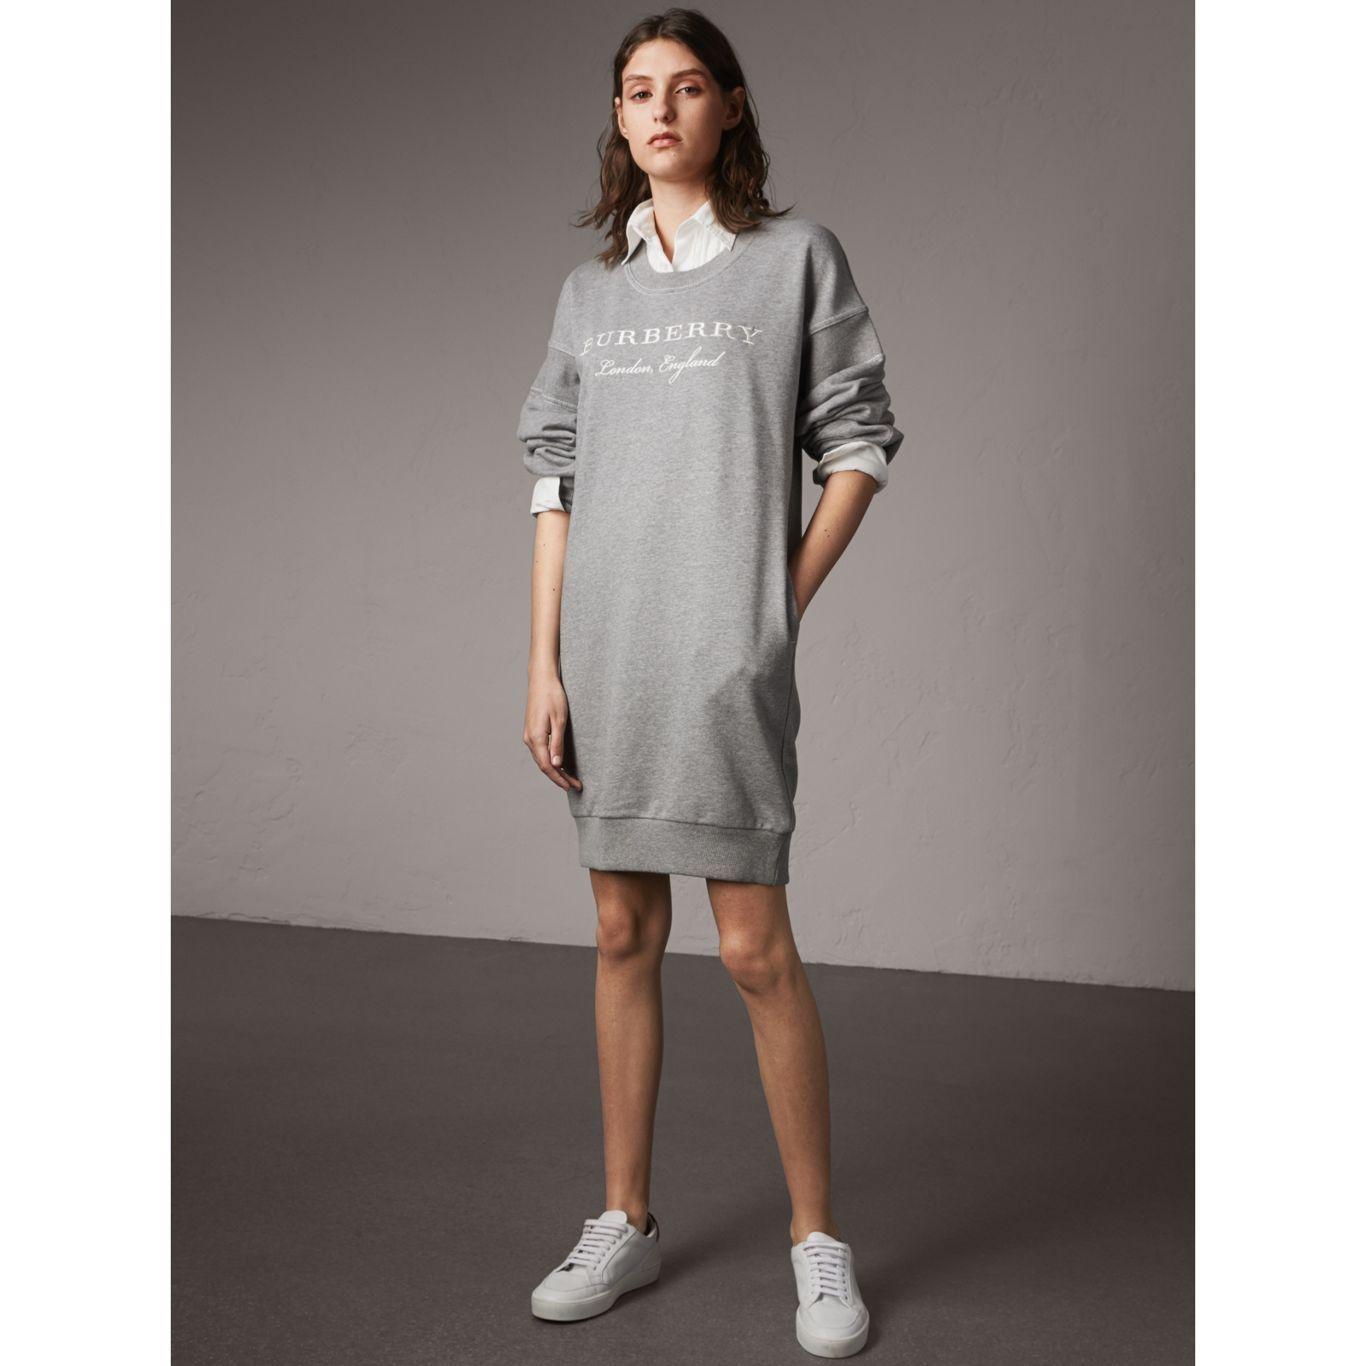 Burberry Robe Sweat Shirt En Jersey De Coton Avec Motif Brode Sweatshirt Dress Dresses Clothes